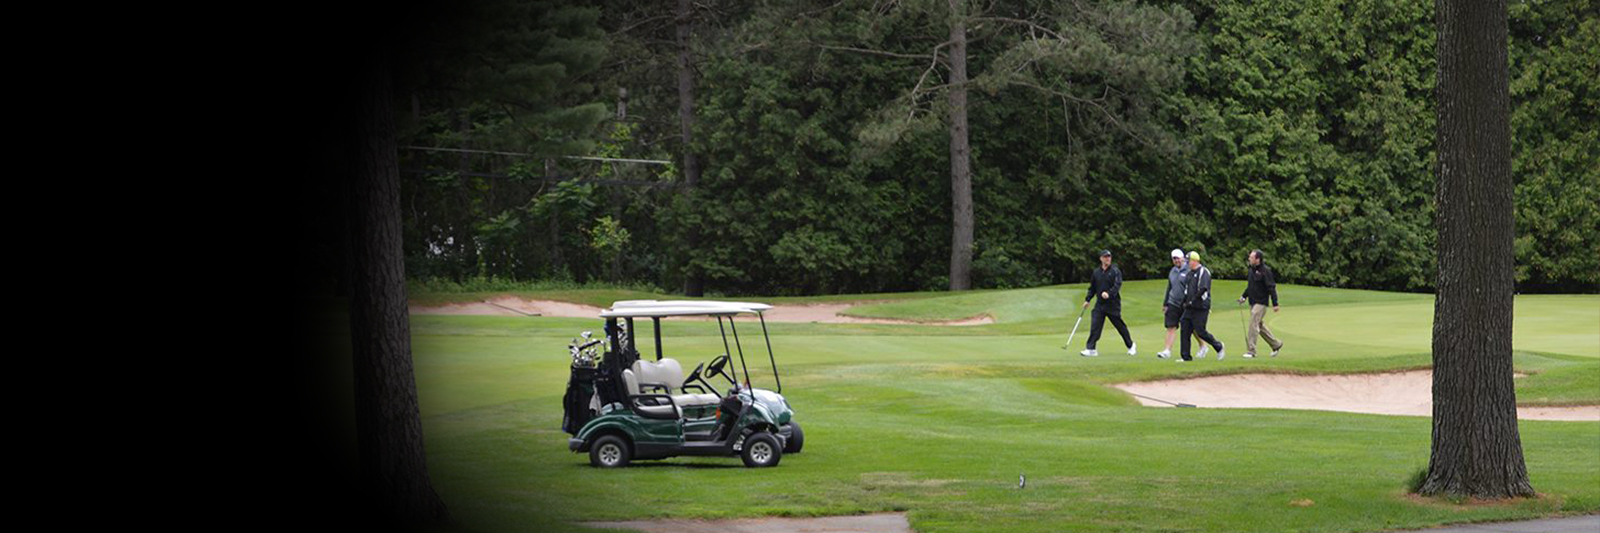 Golf2018.jpg